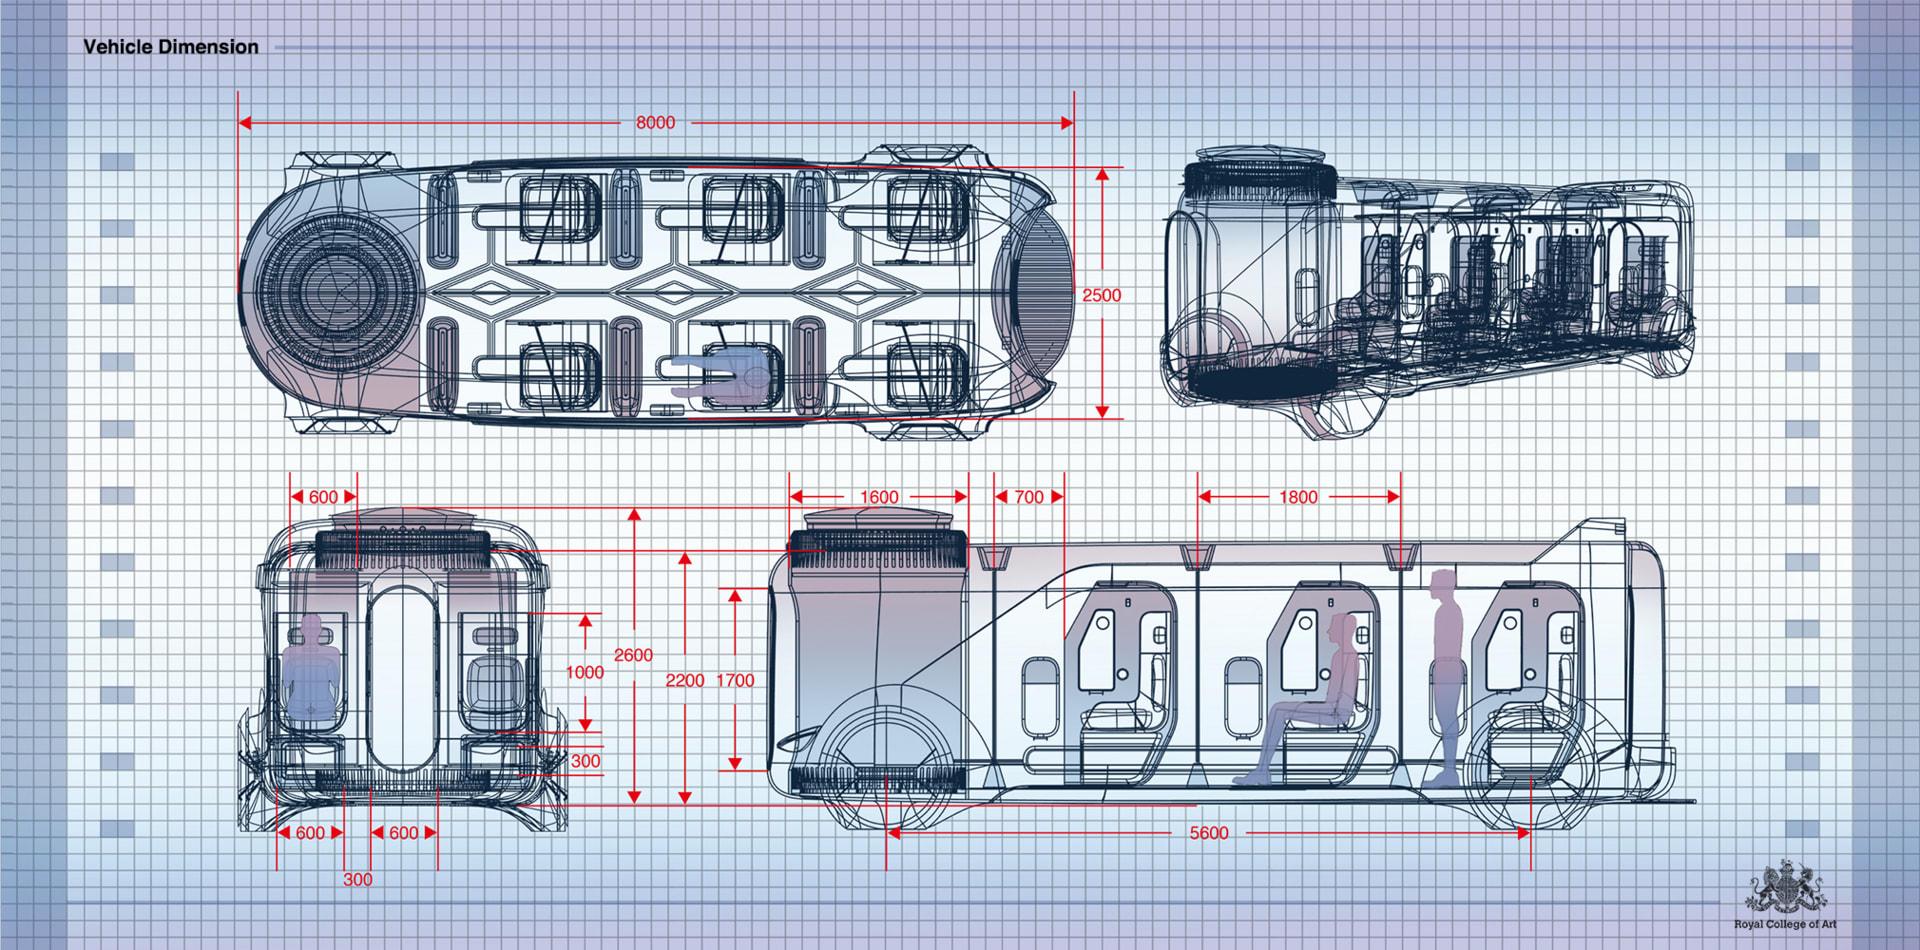 22.Vehicle dimension